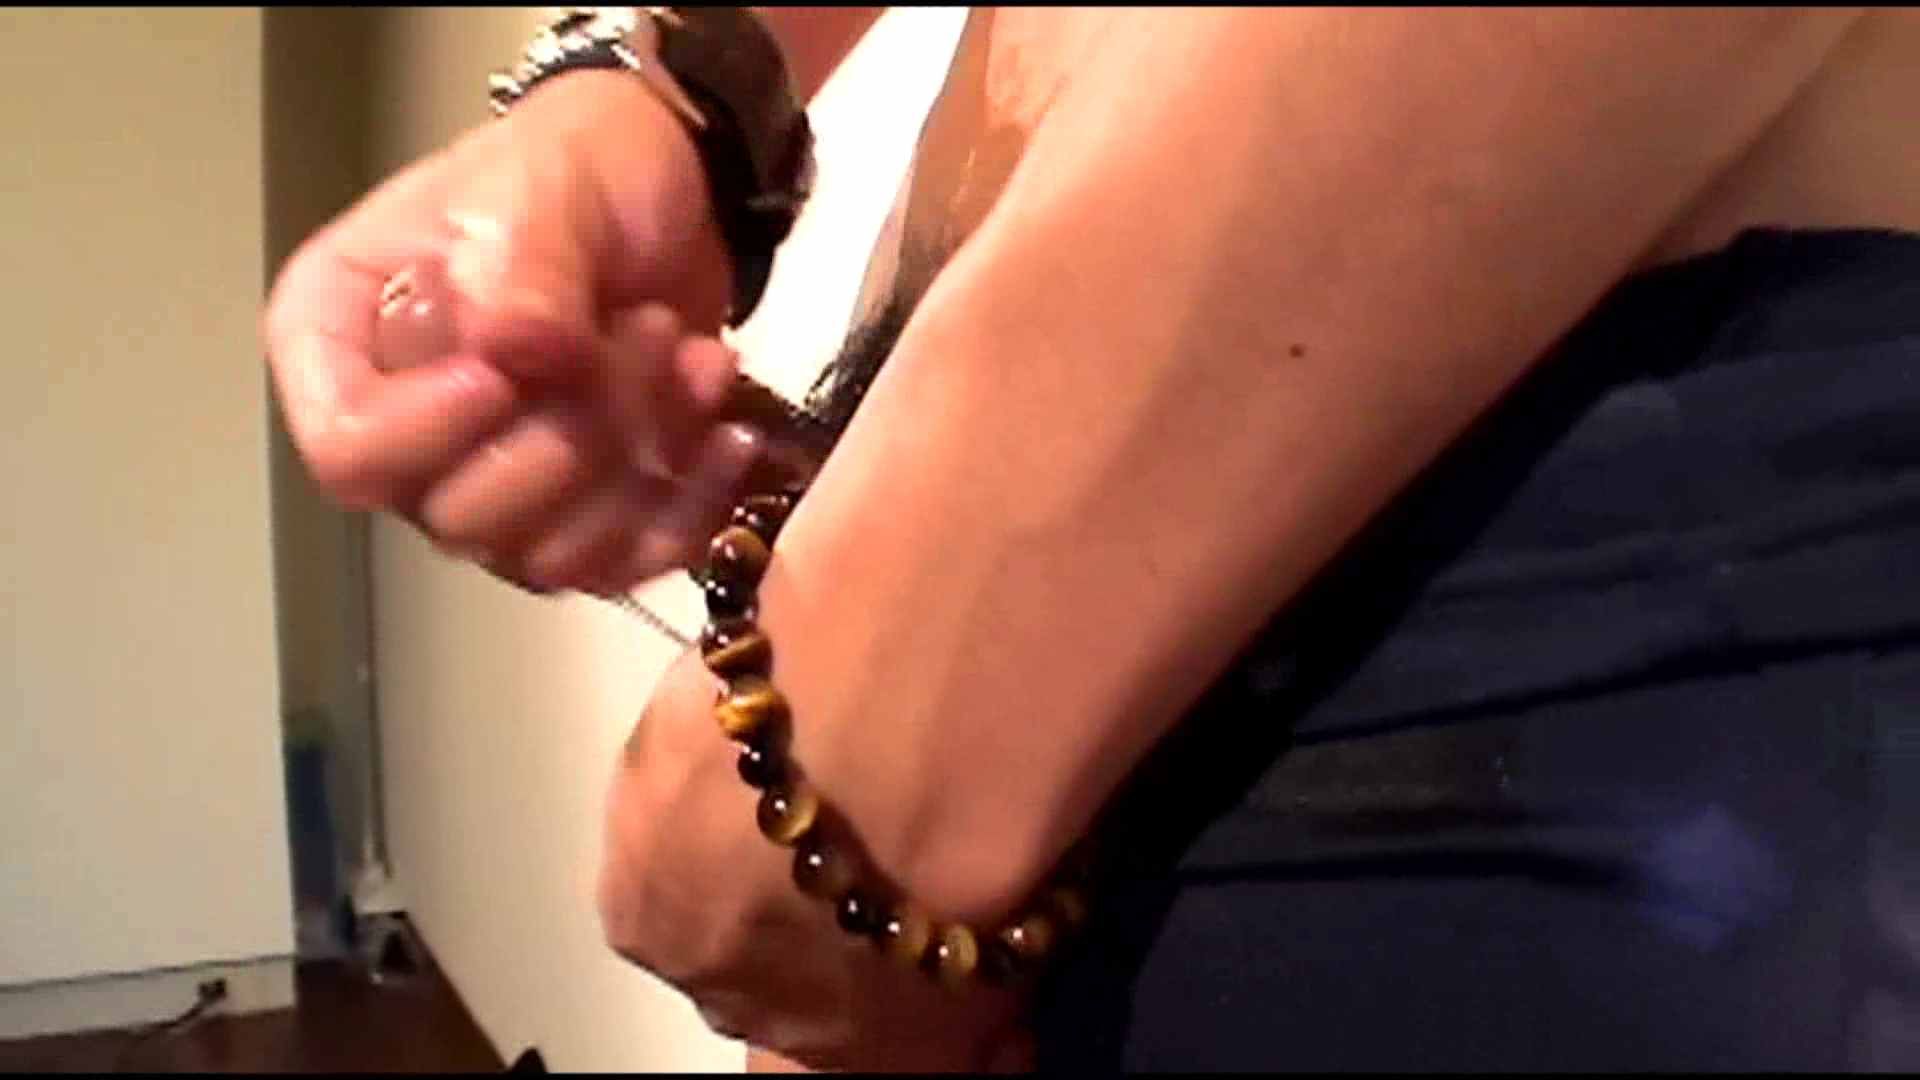 (HDバージョン)俺、チャラ男じゃないっす。違うっす...。VOL.01 男天国 | オナニー特集  88pic 71